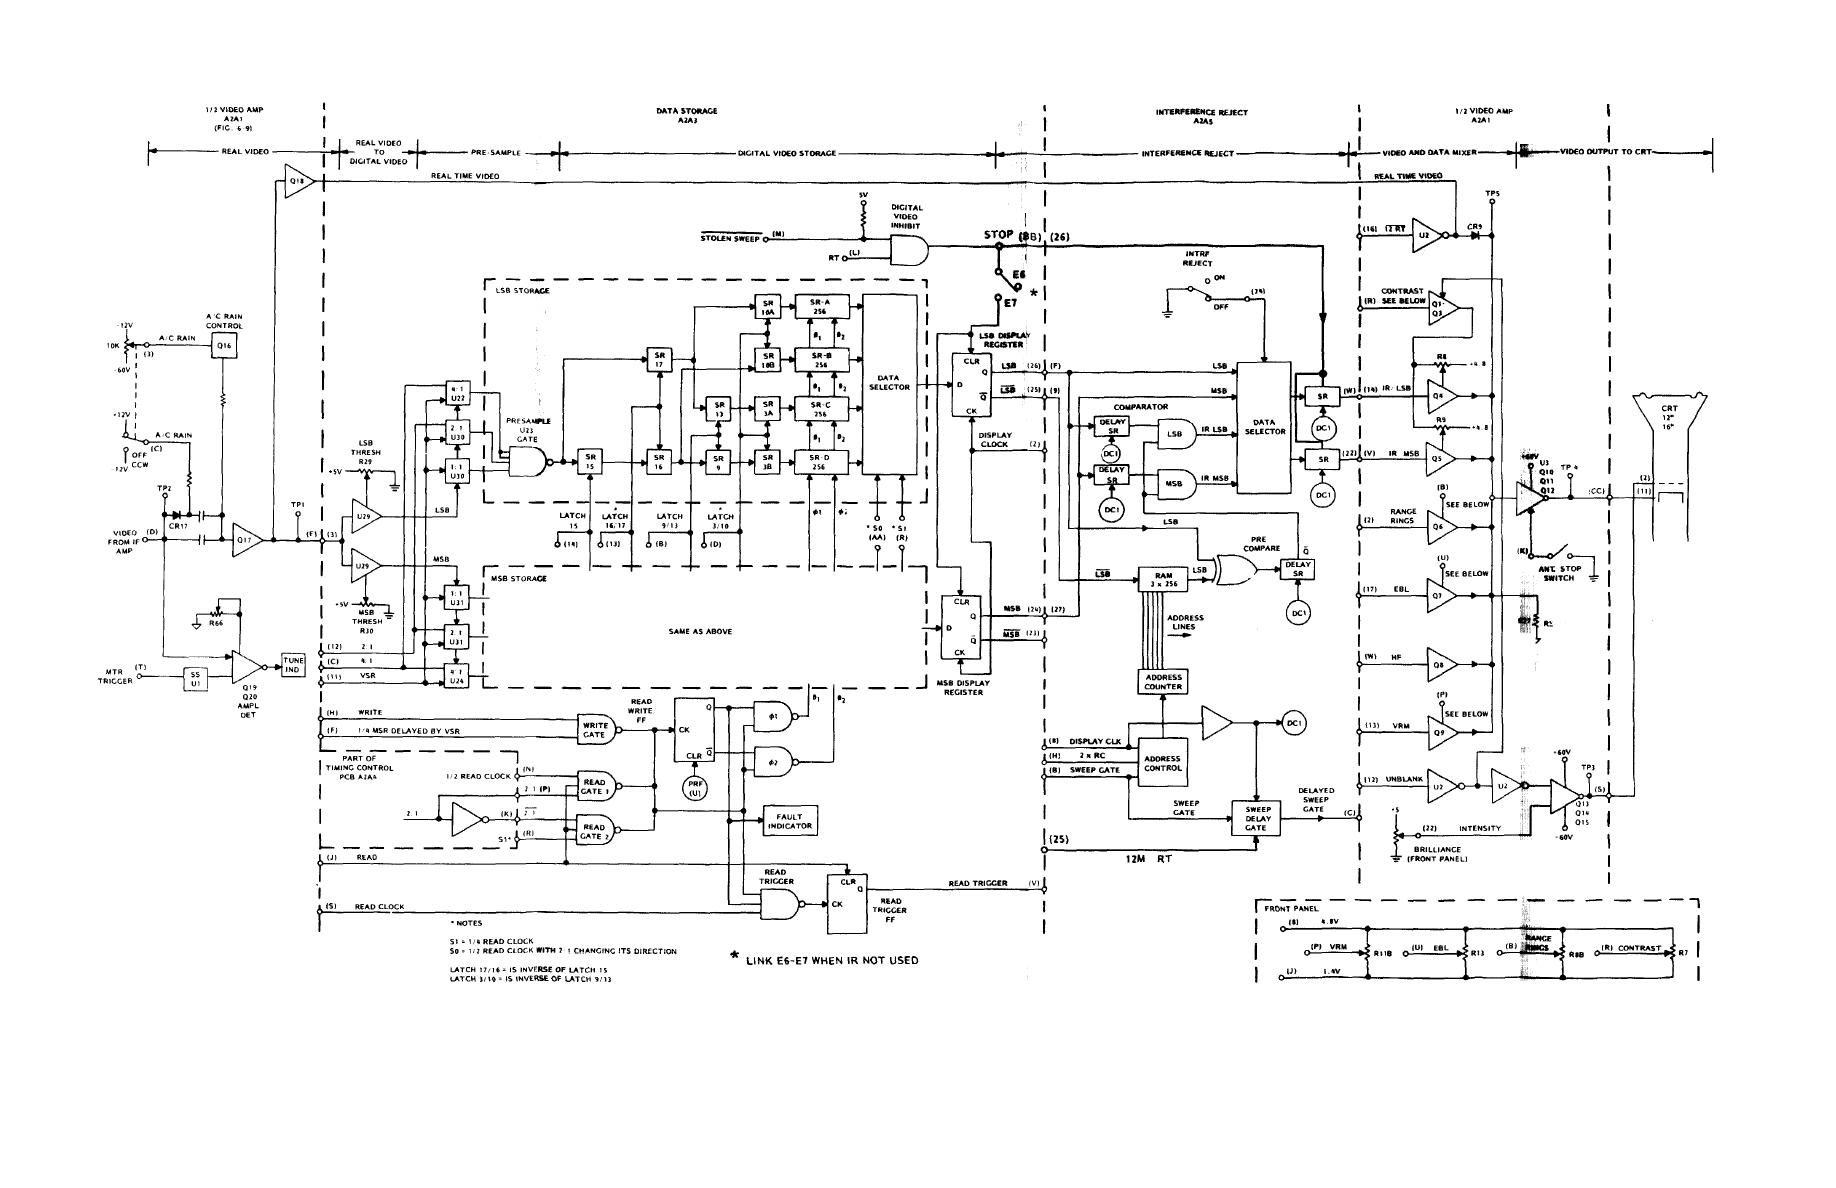 Figure 4 16 Video Functional Block Diagram